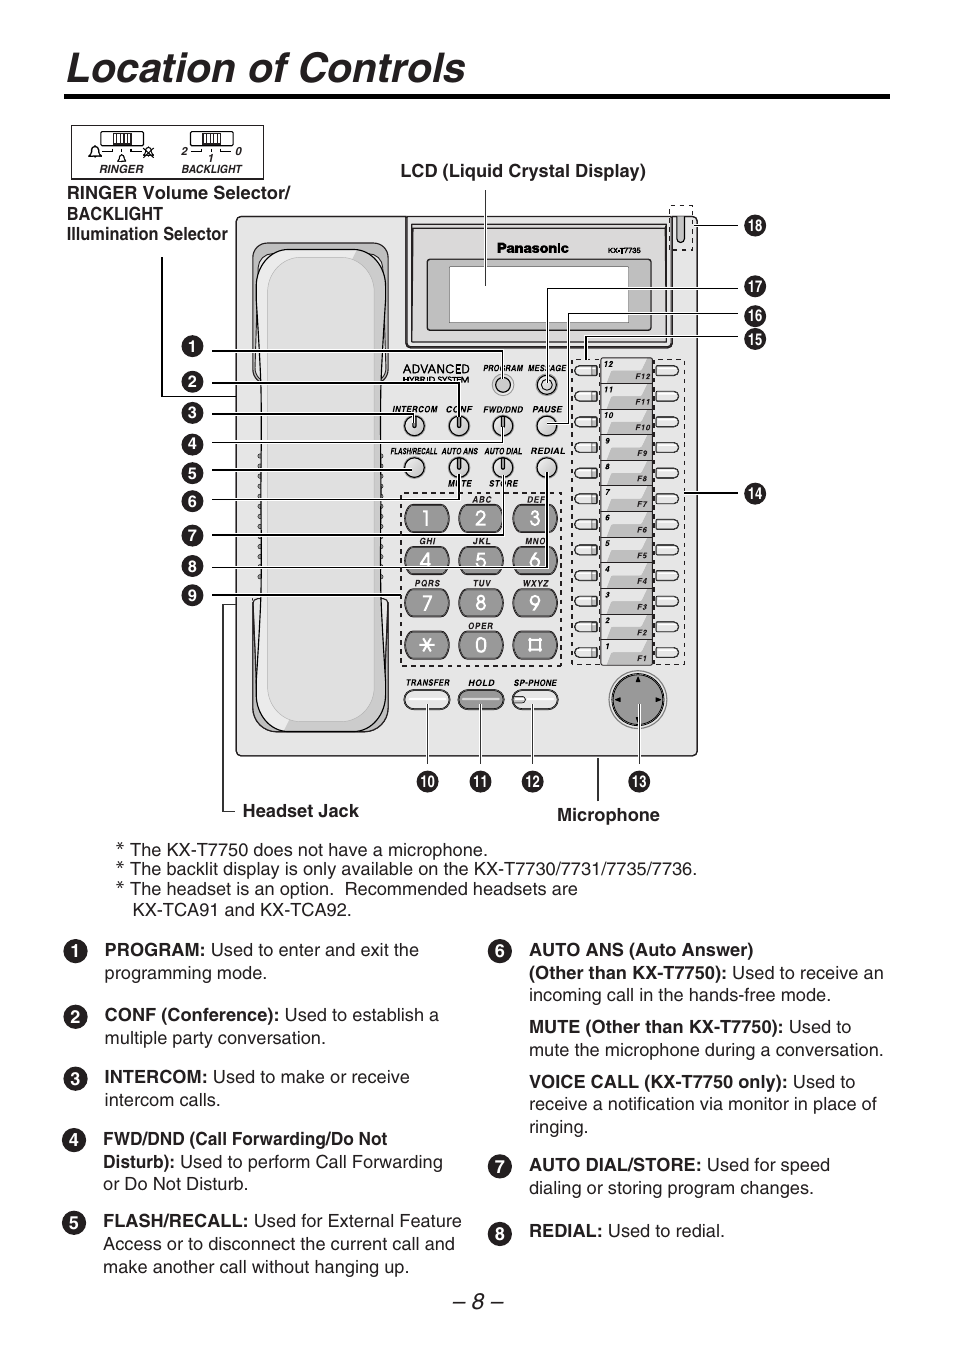 location of controls panasonic kx t7731 user manual page 8 16 rh manualsdir com panasonic kx-t7730x user manual panasonic kx-t7730 user manual speed dial